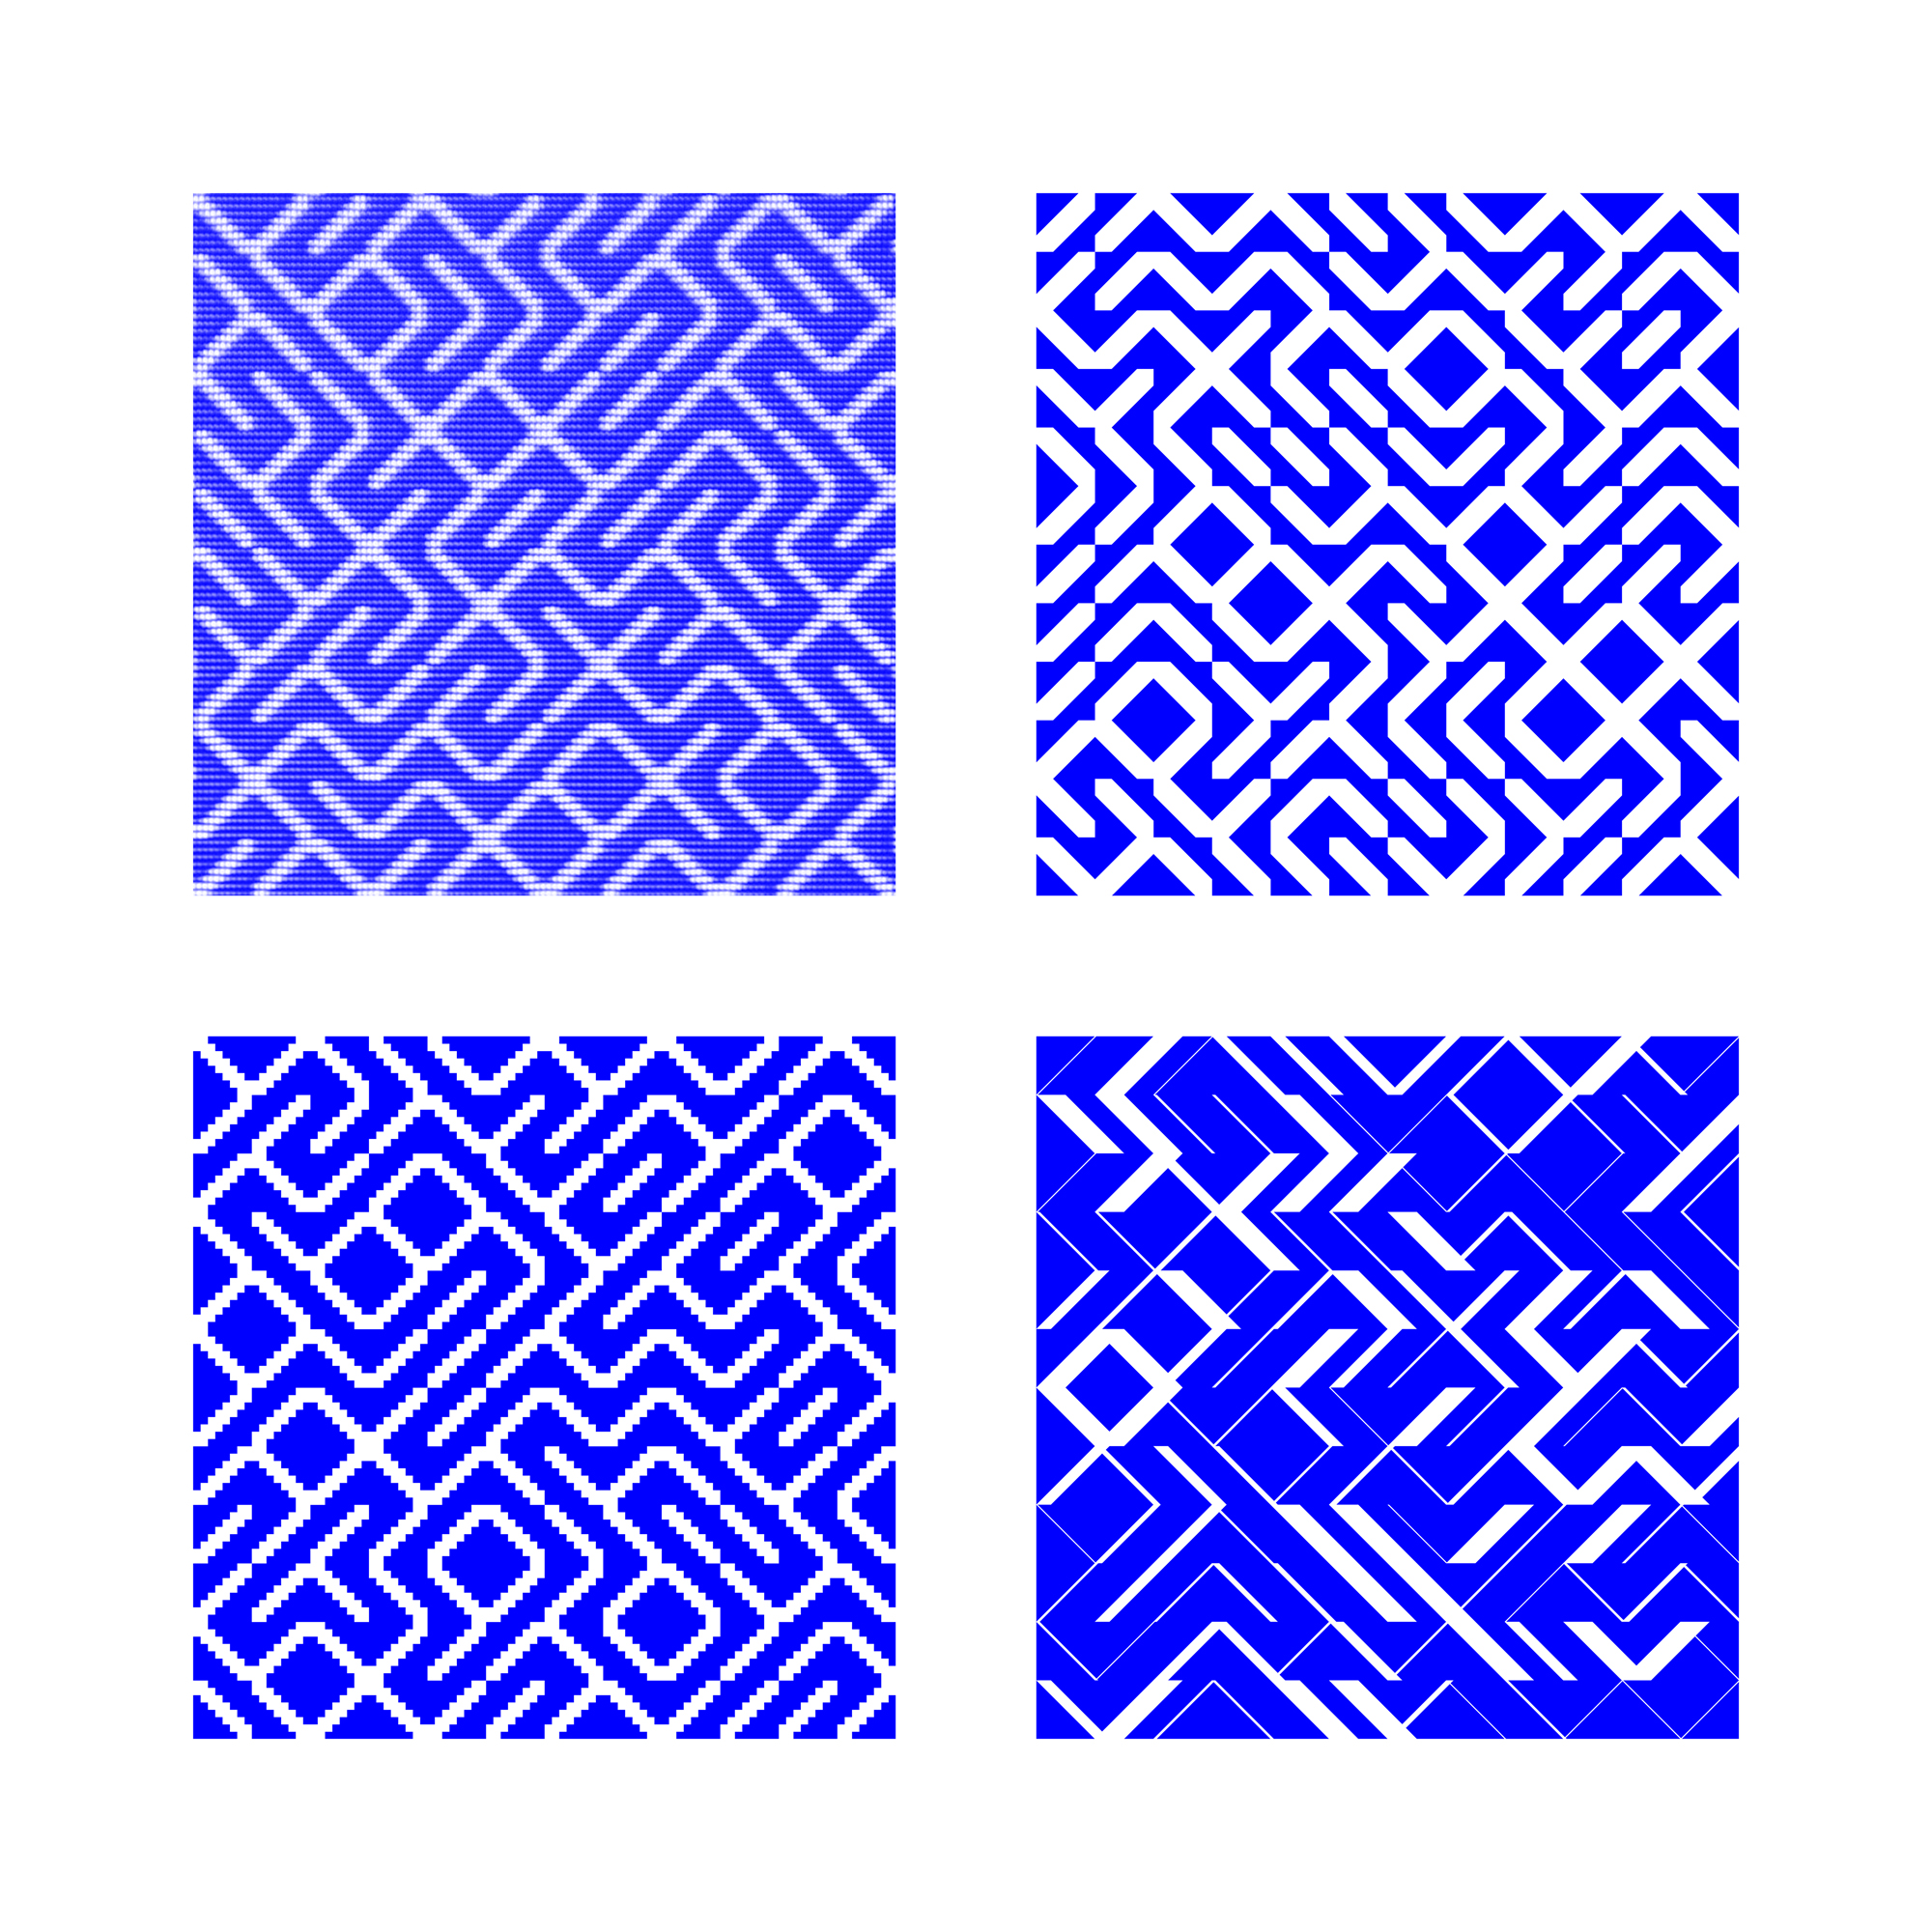 Casey Reas, YesNo (group 1), series of 4 C-prints on dibond, 40 x 40 cm each, 2012